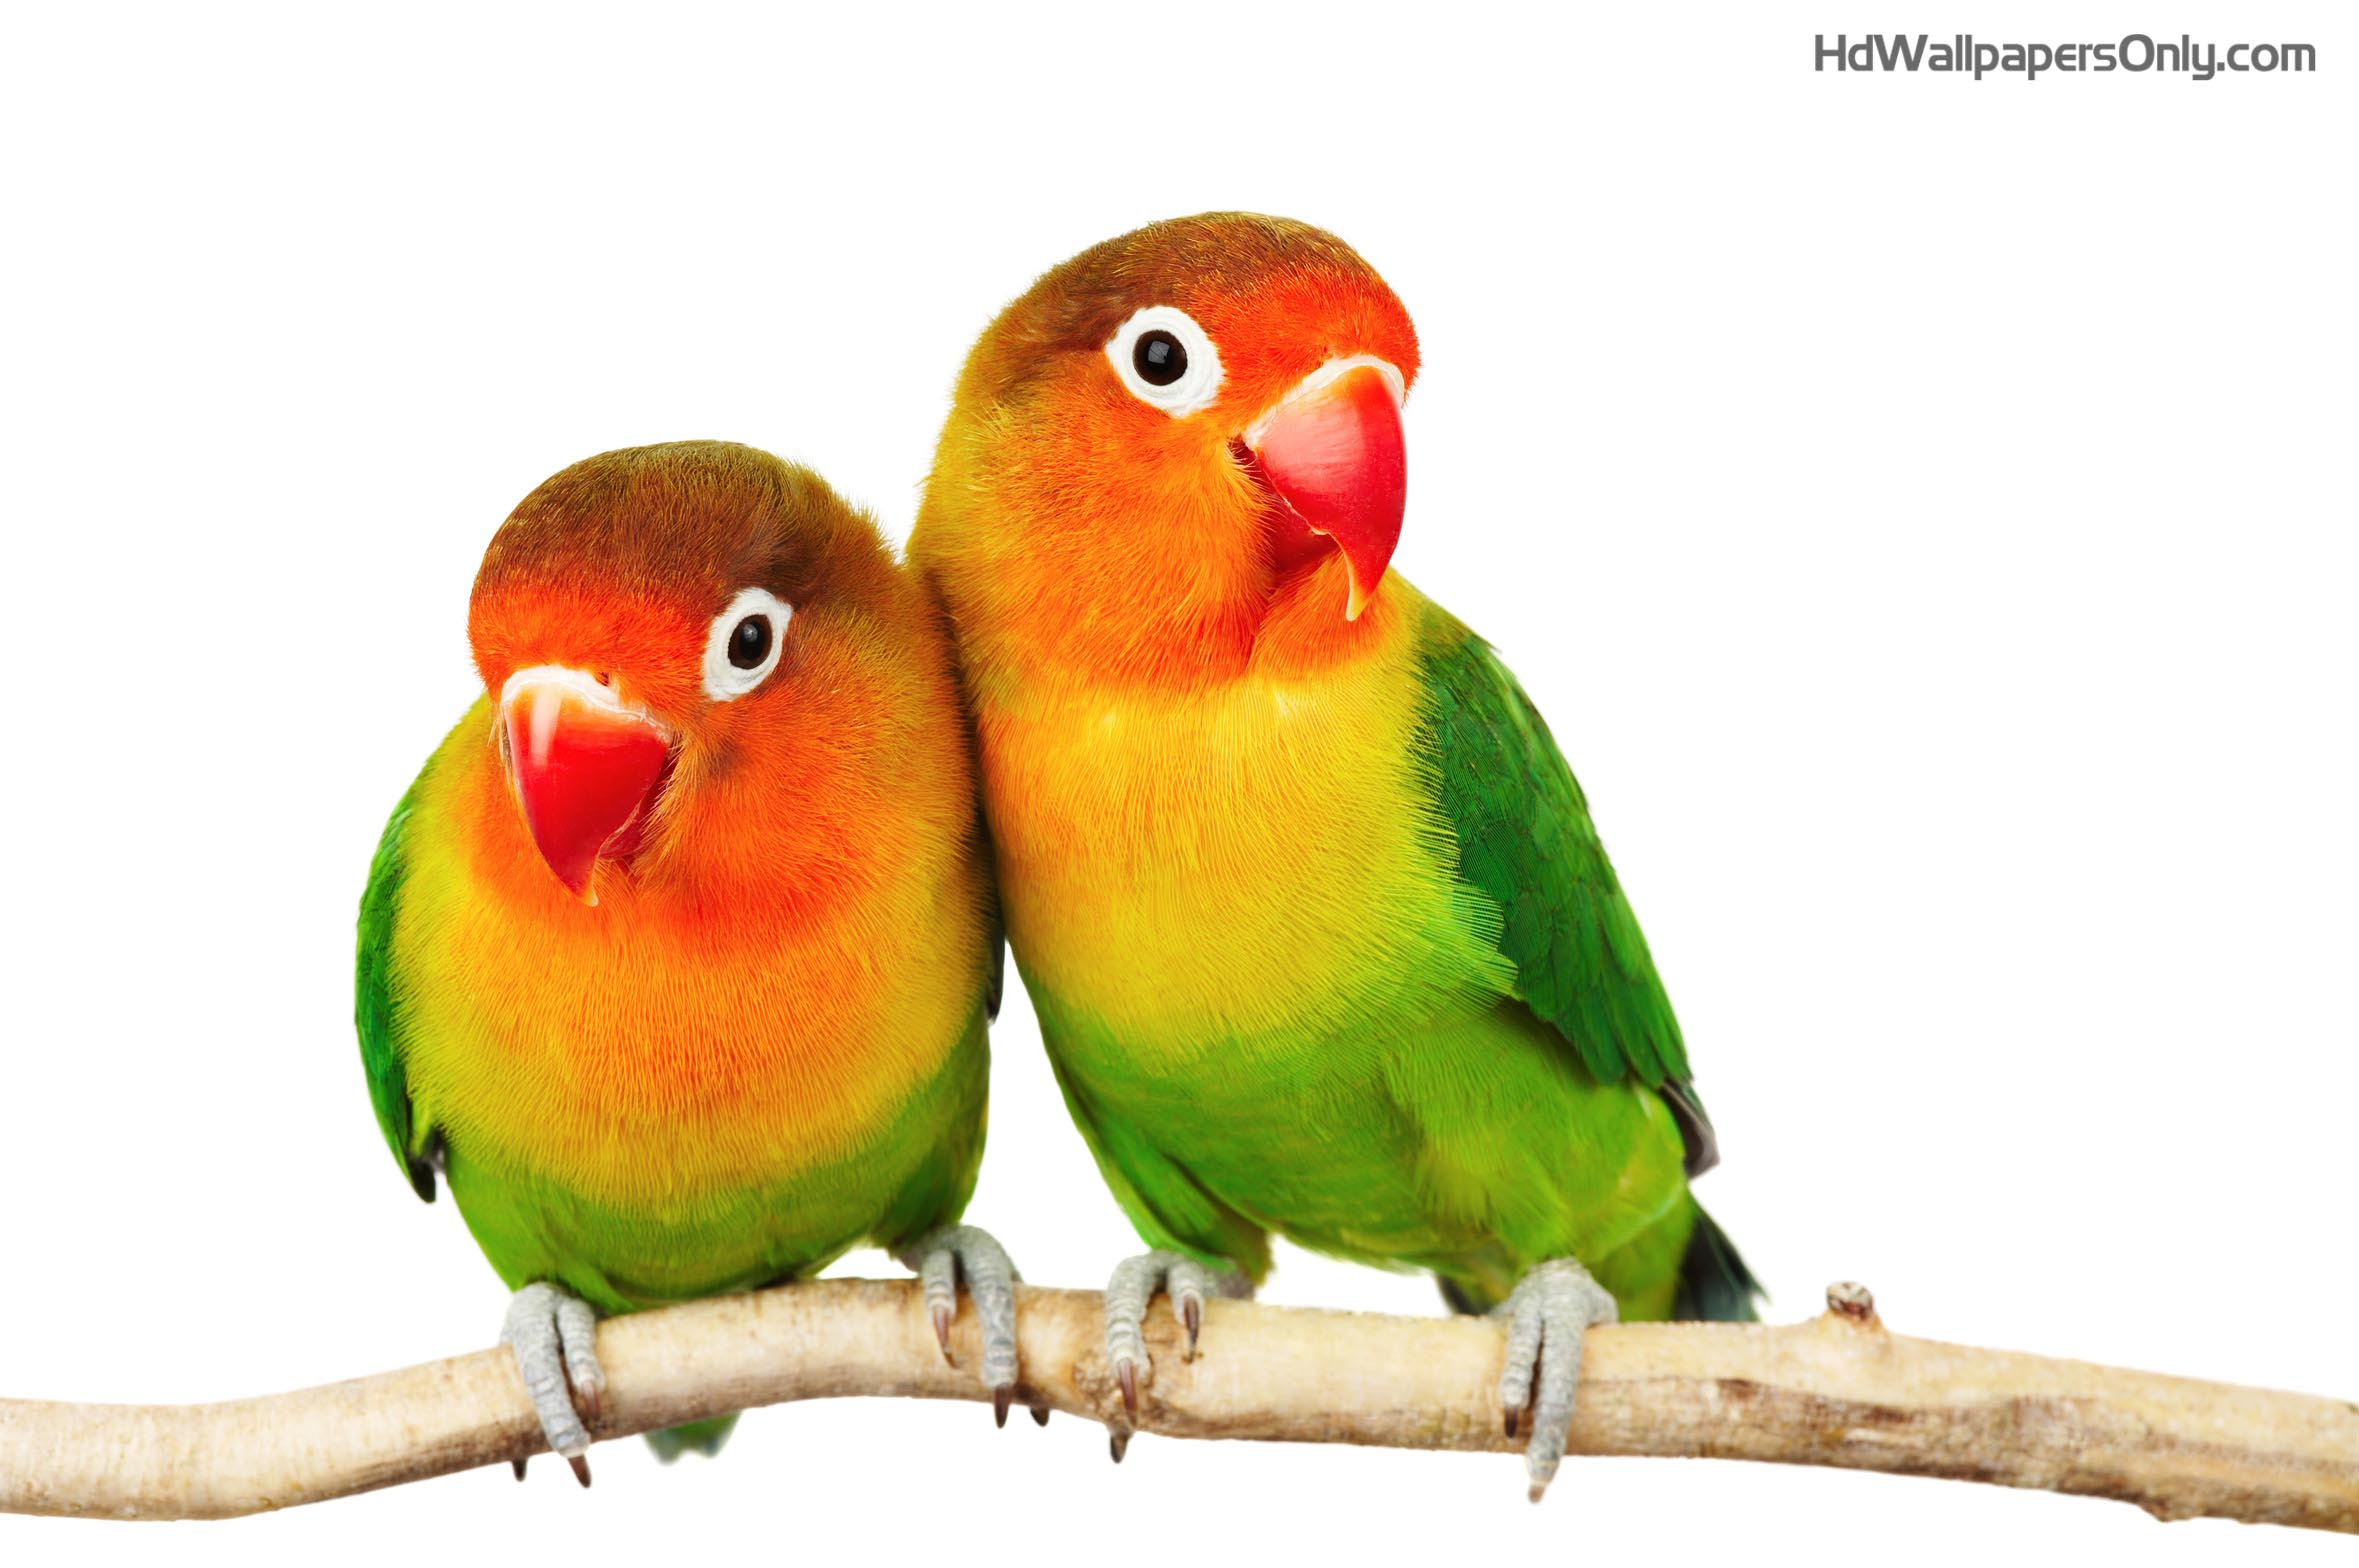 lovebirds png hd transparent lovebirds hd png images pluspng